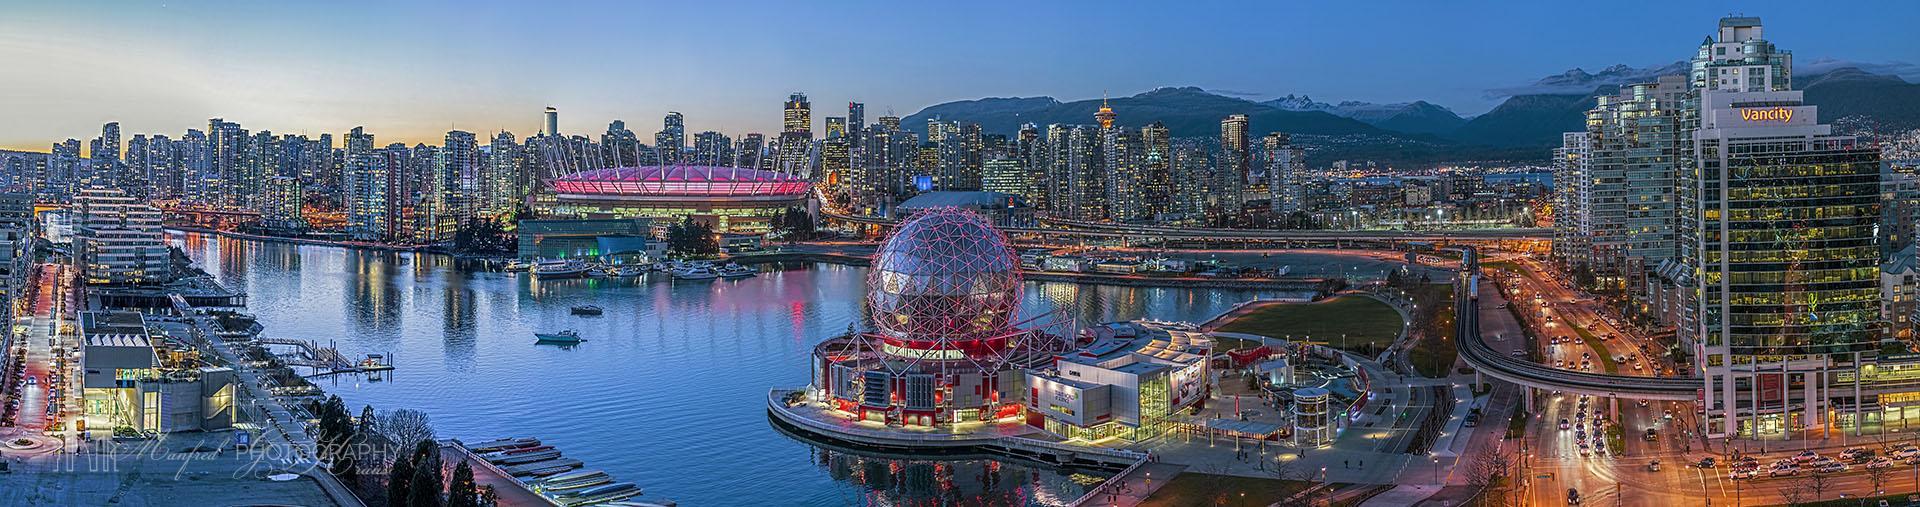 Vancouver SE TwilightV T235A